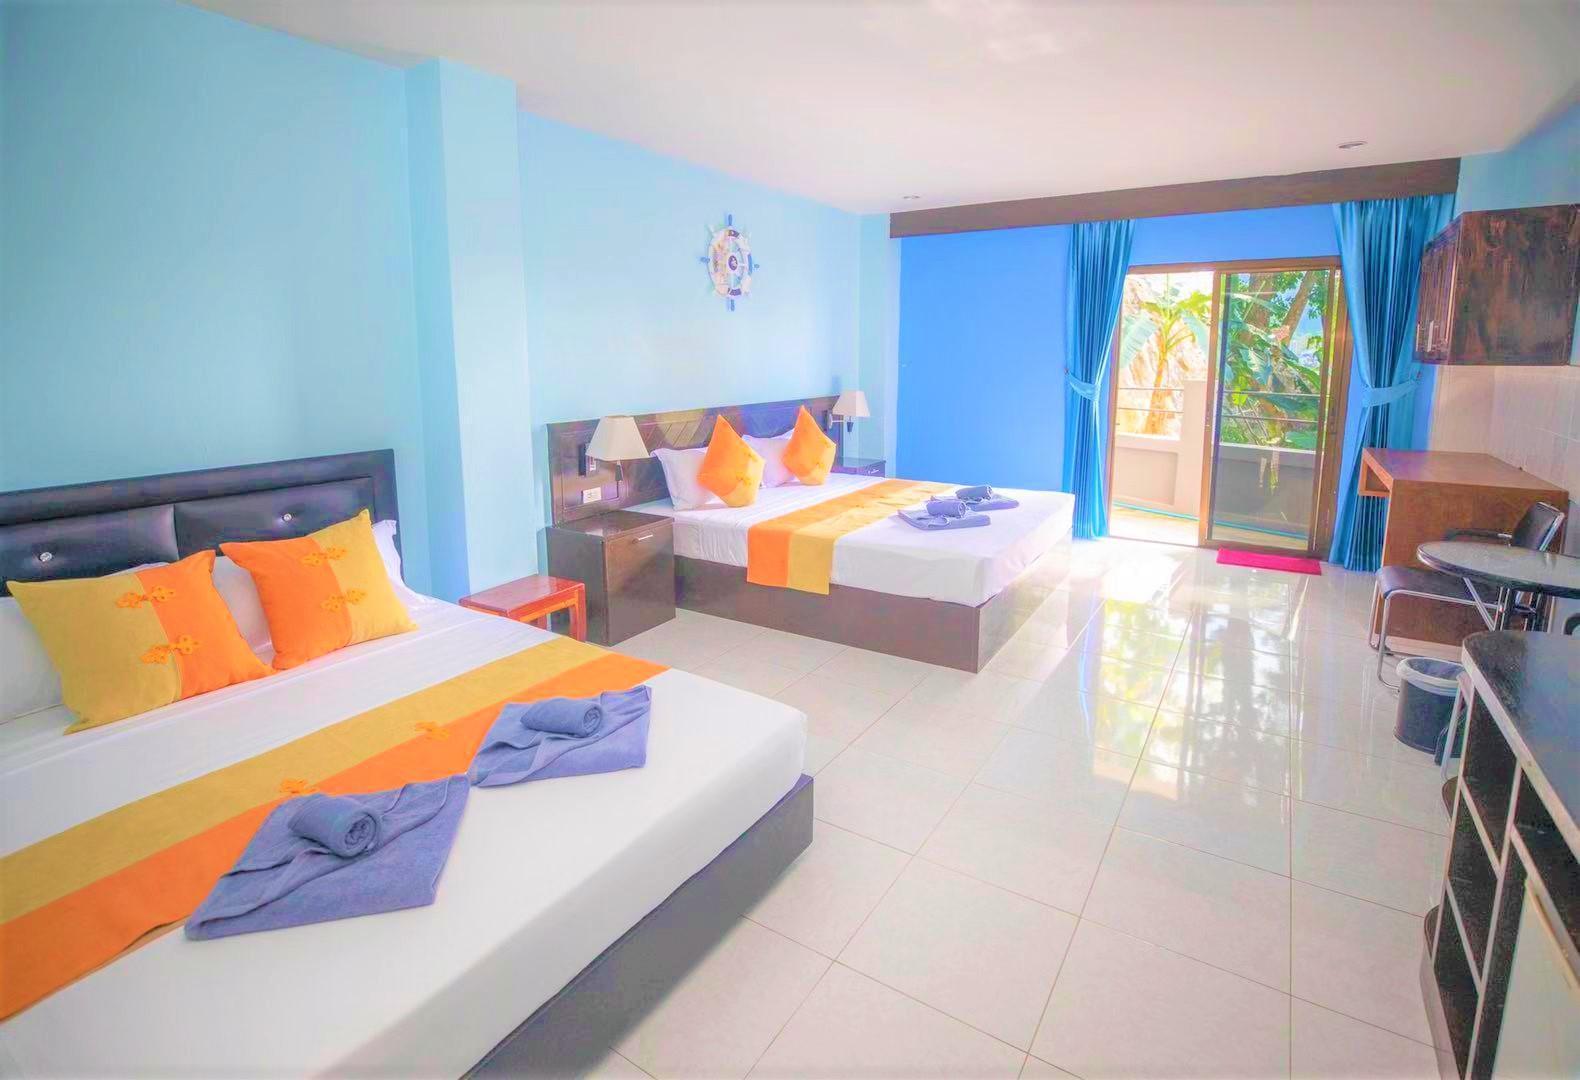 DS Villa Family Room-80 อพาร์ตเมนต์ 1 ห้องนอน 1 ห้องน้ำส่วนตัว ขนาด 36 ตร.ม. – ป่าตอง